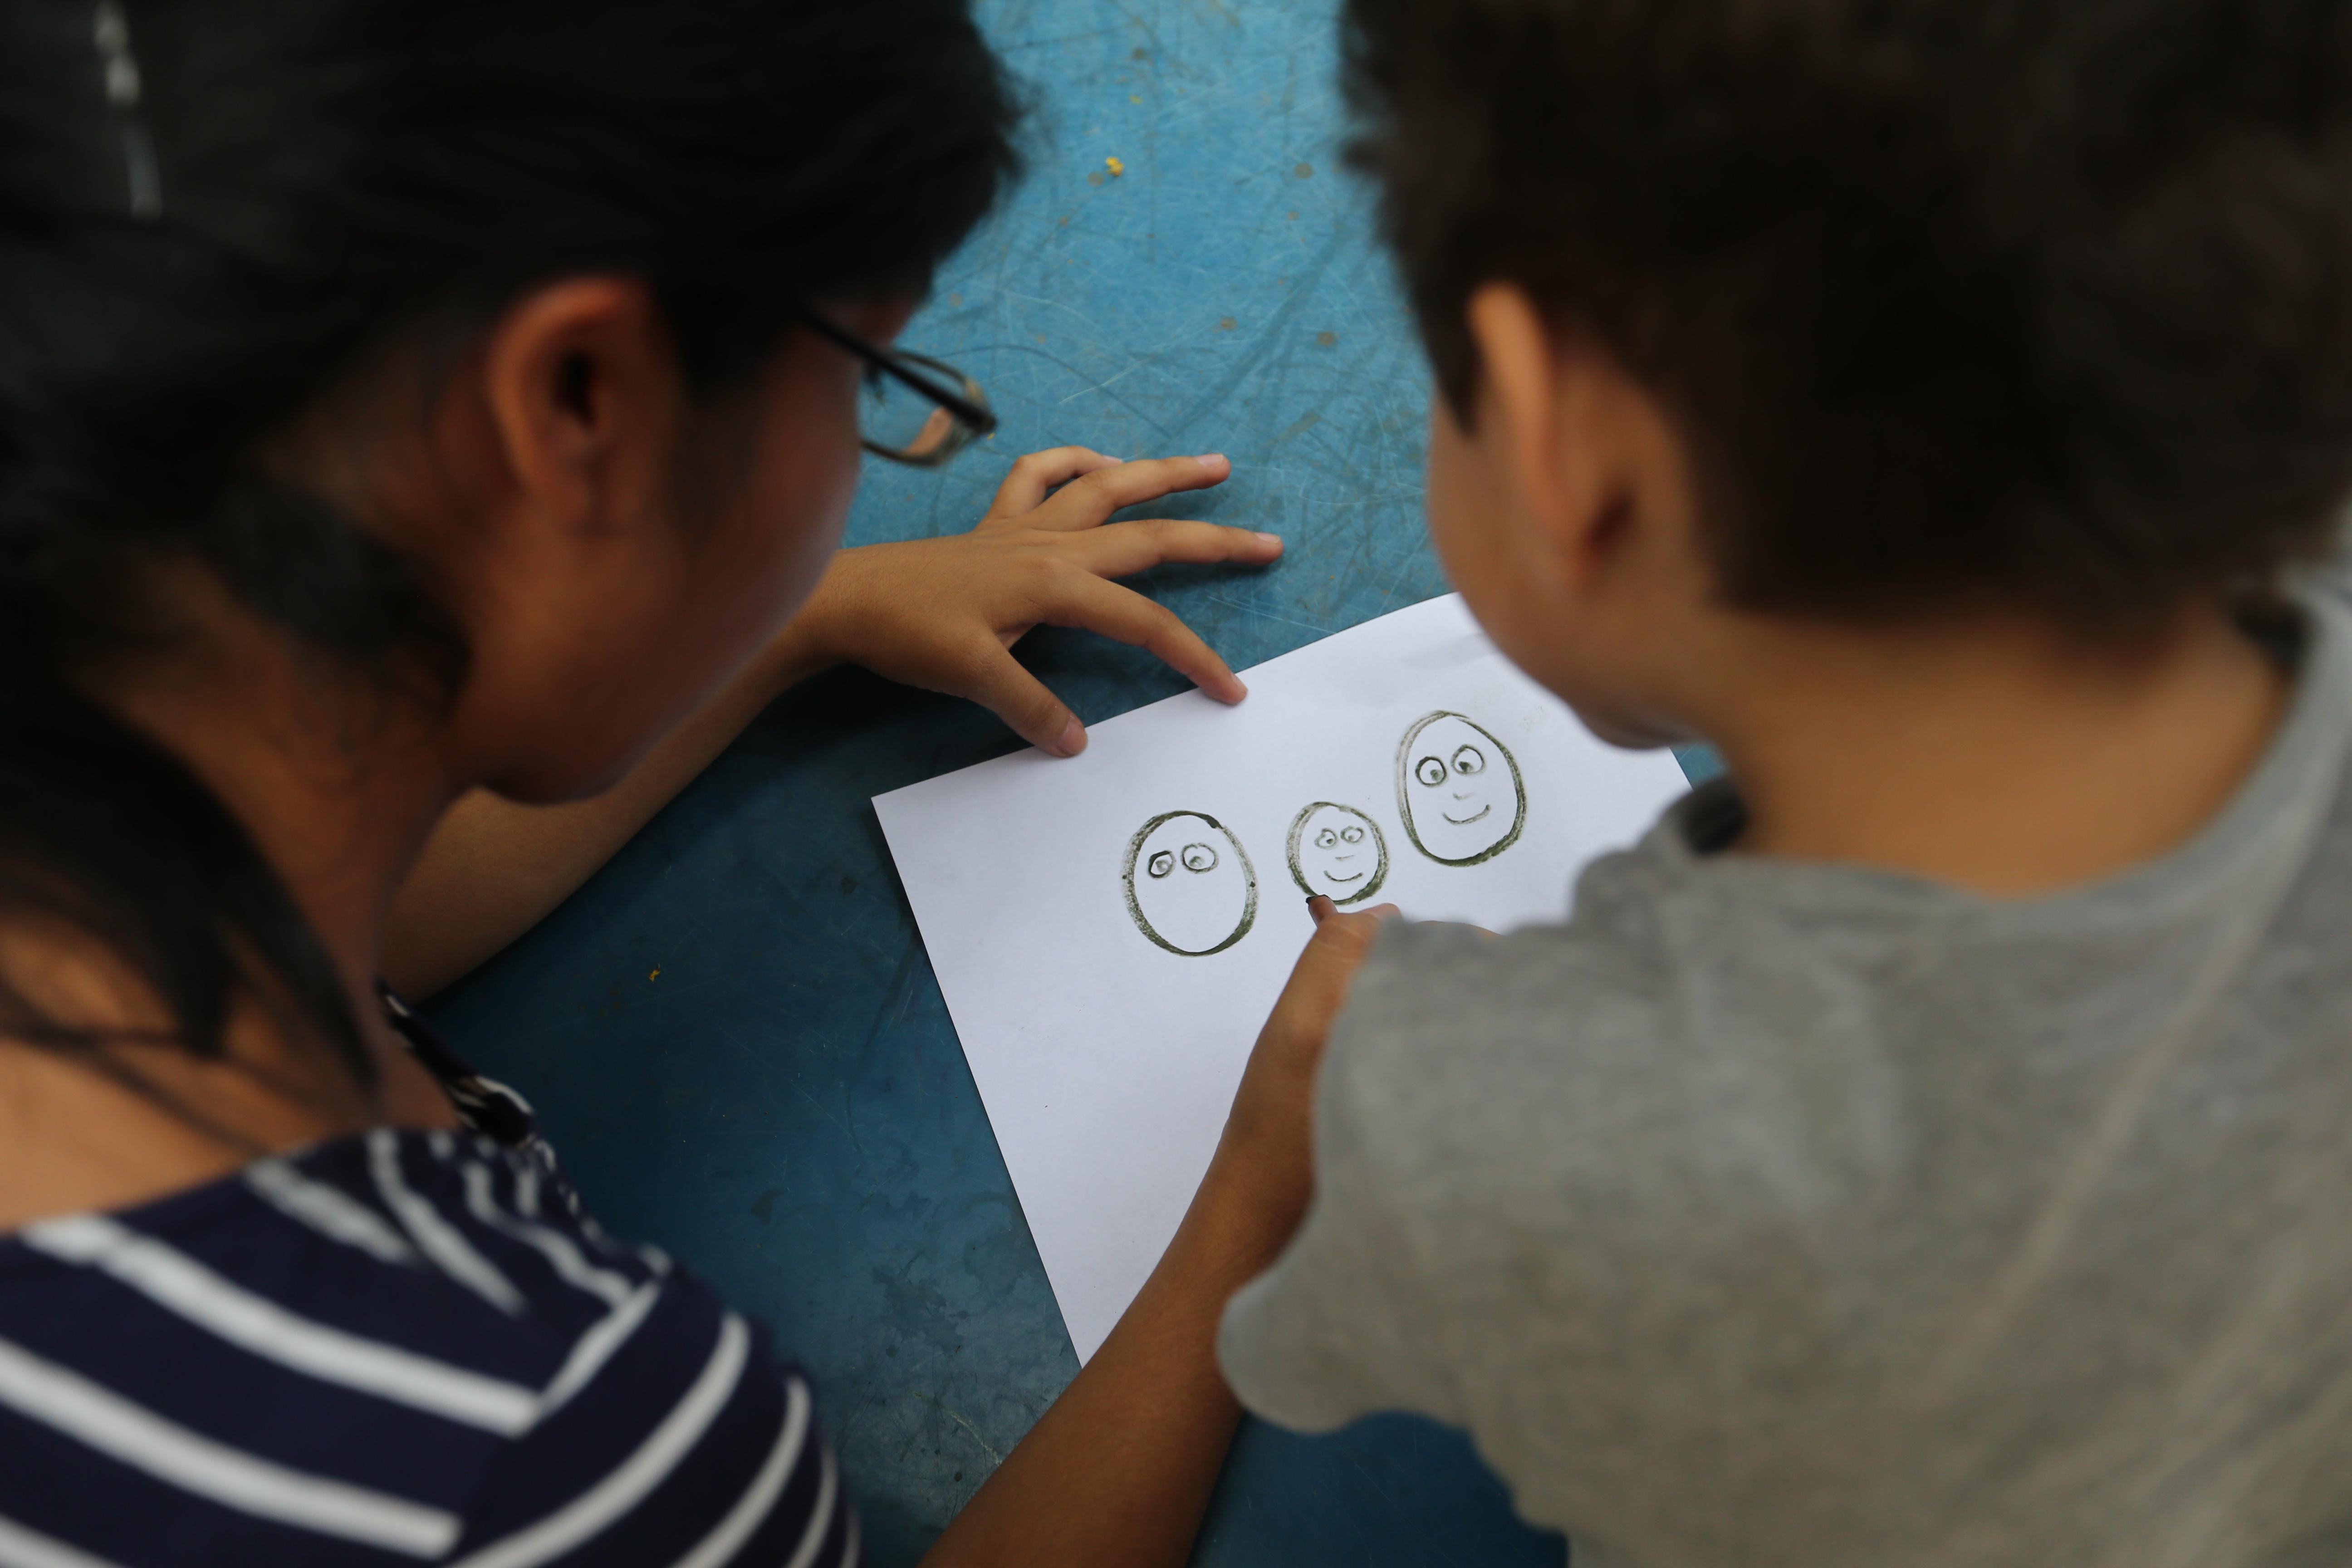 Teacher child Faces